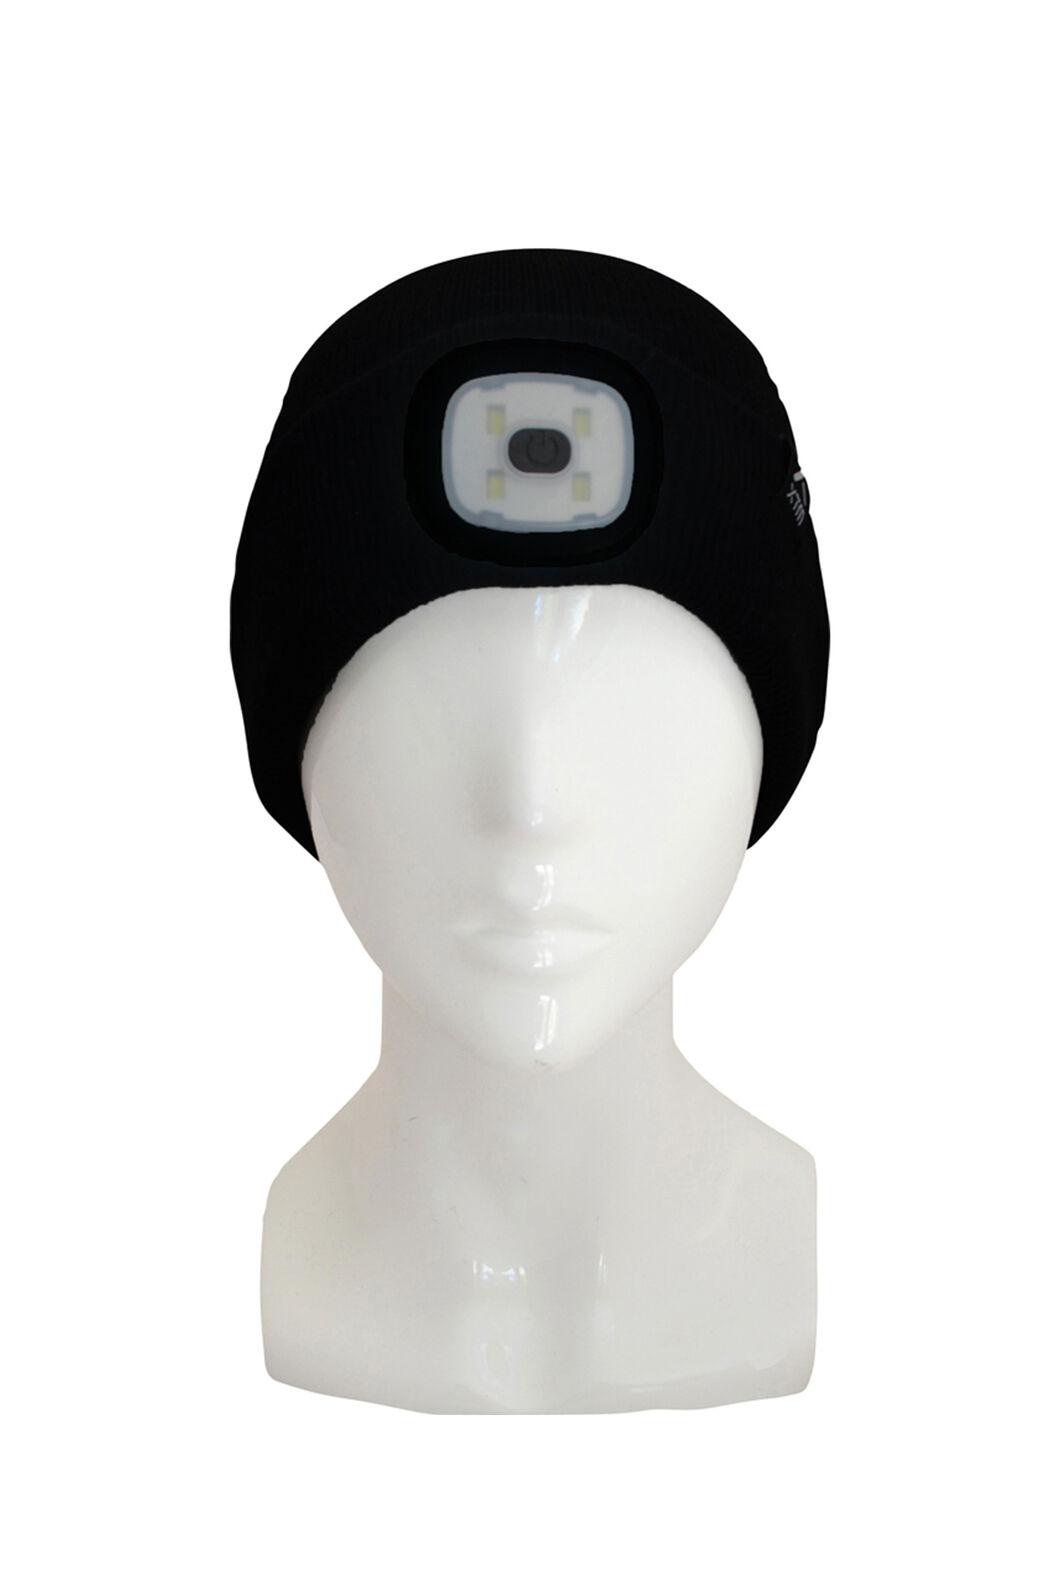 XTM Blinder Beanie Headlamp, None, hi-res